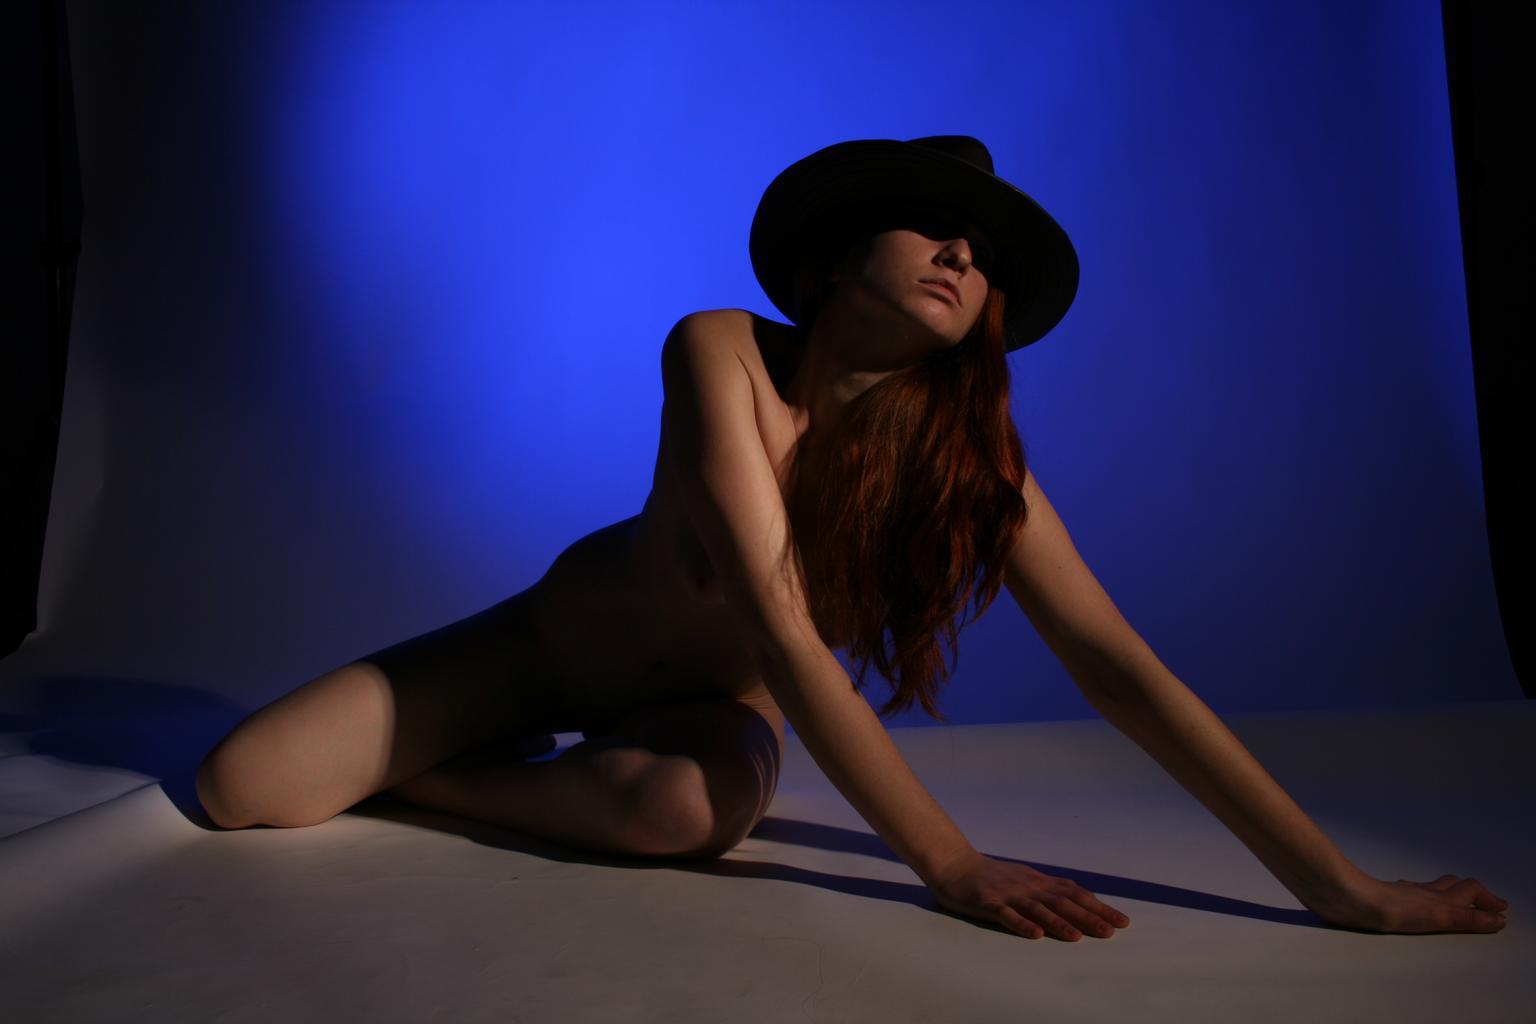 sei modelka s klobúkom